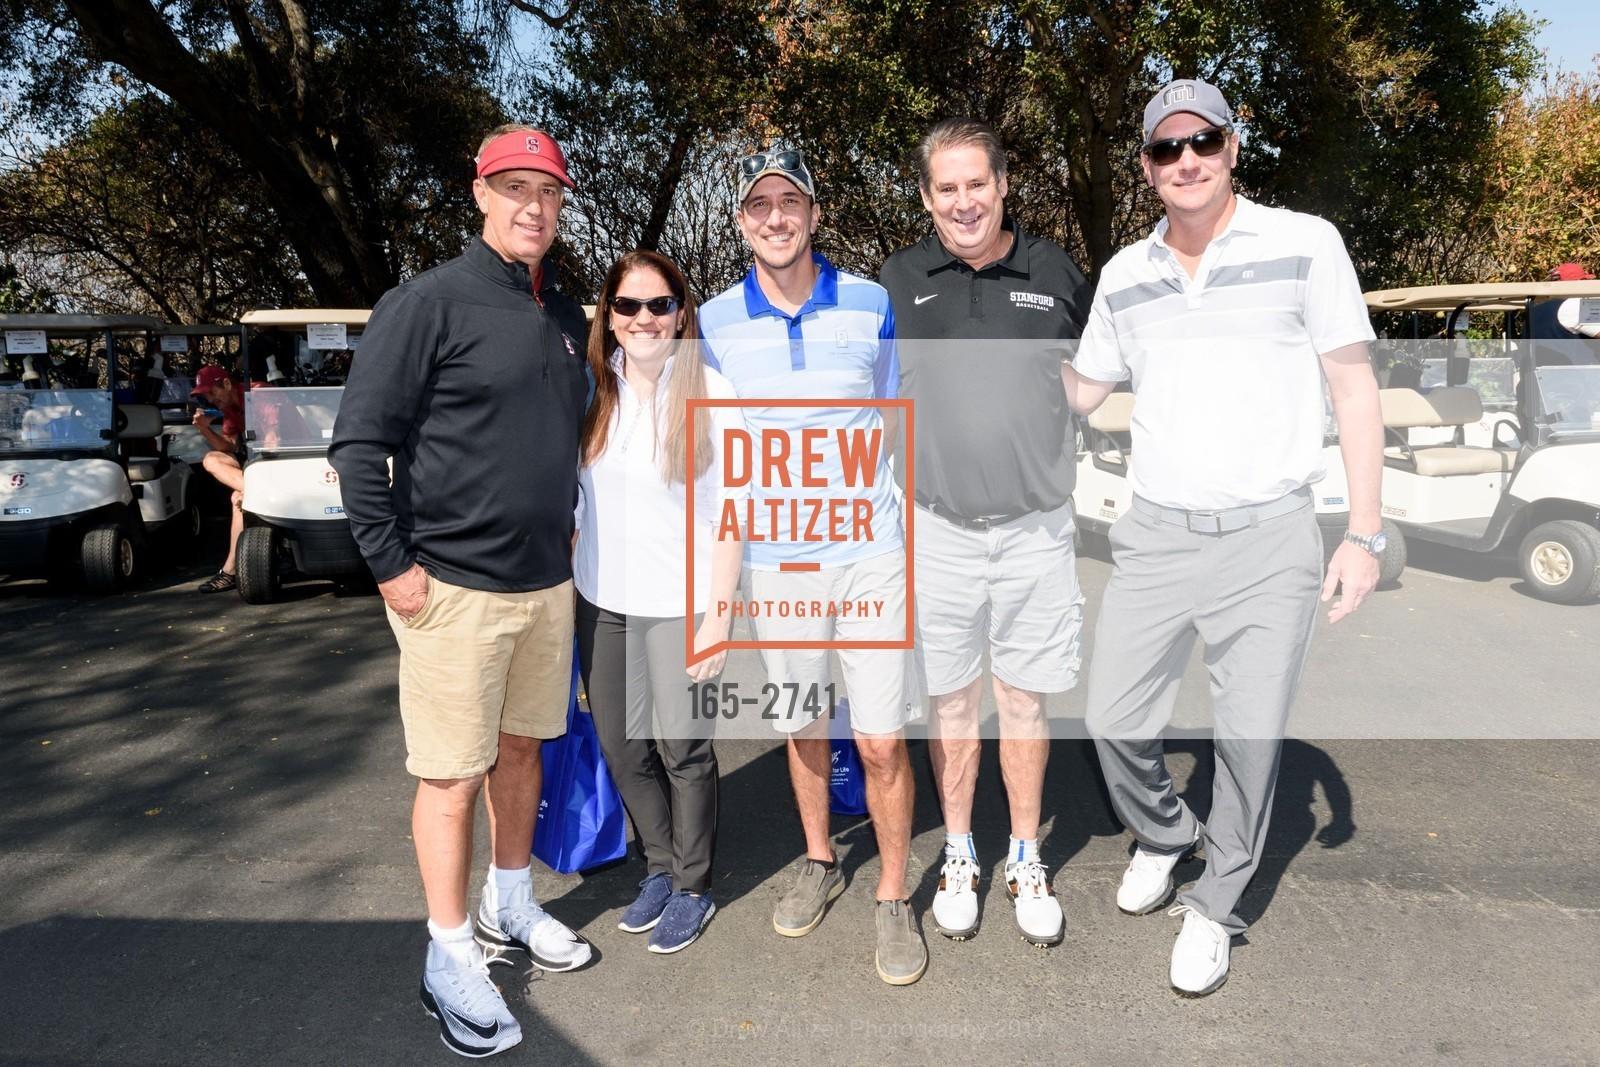 John Paye, Sue Plumer, Brad Hauser, Brent Hauser, Photo #165-2741